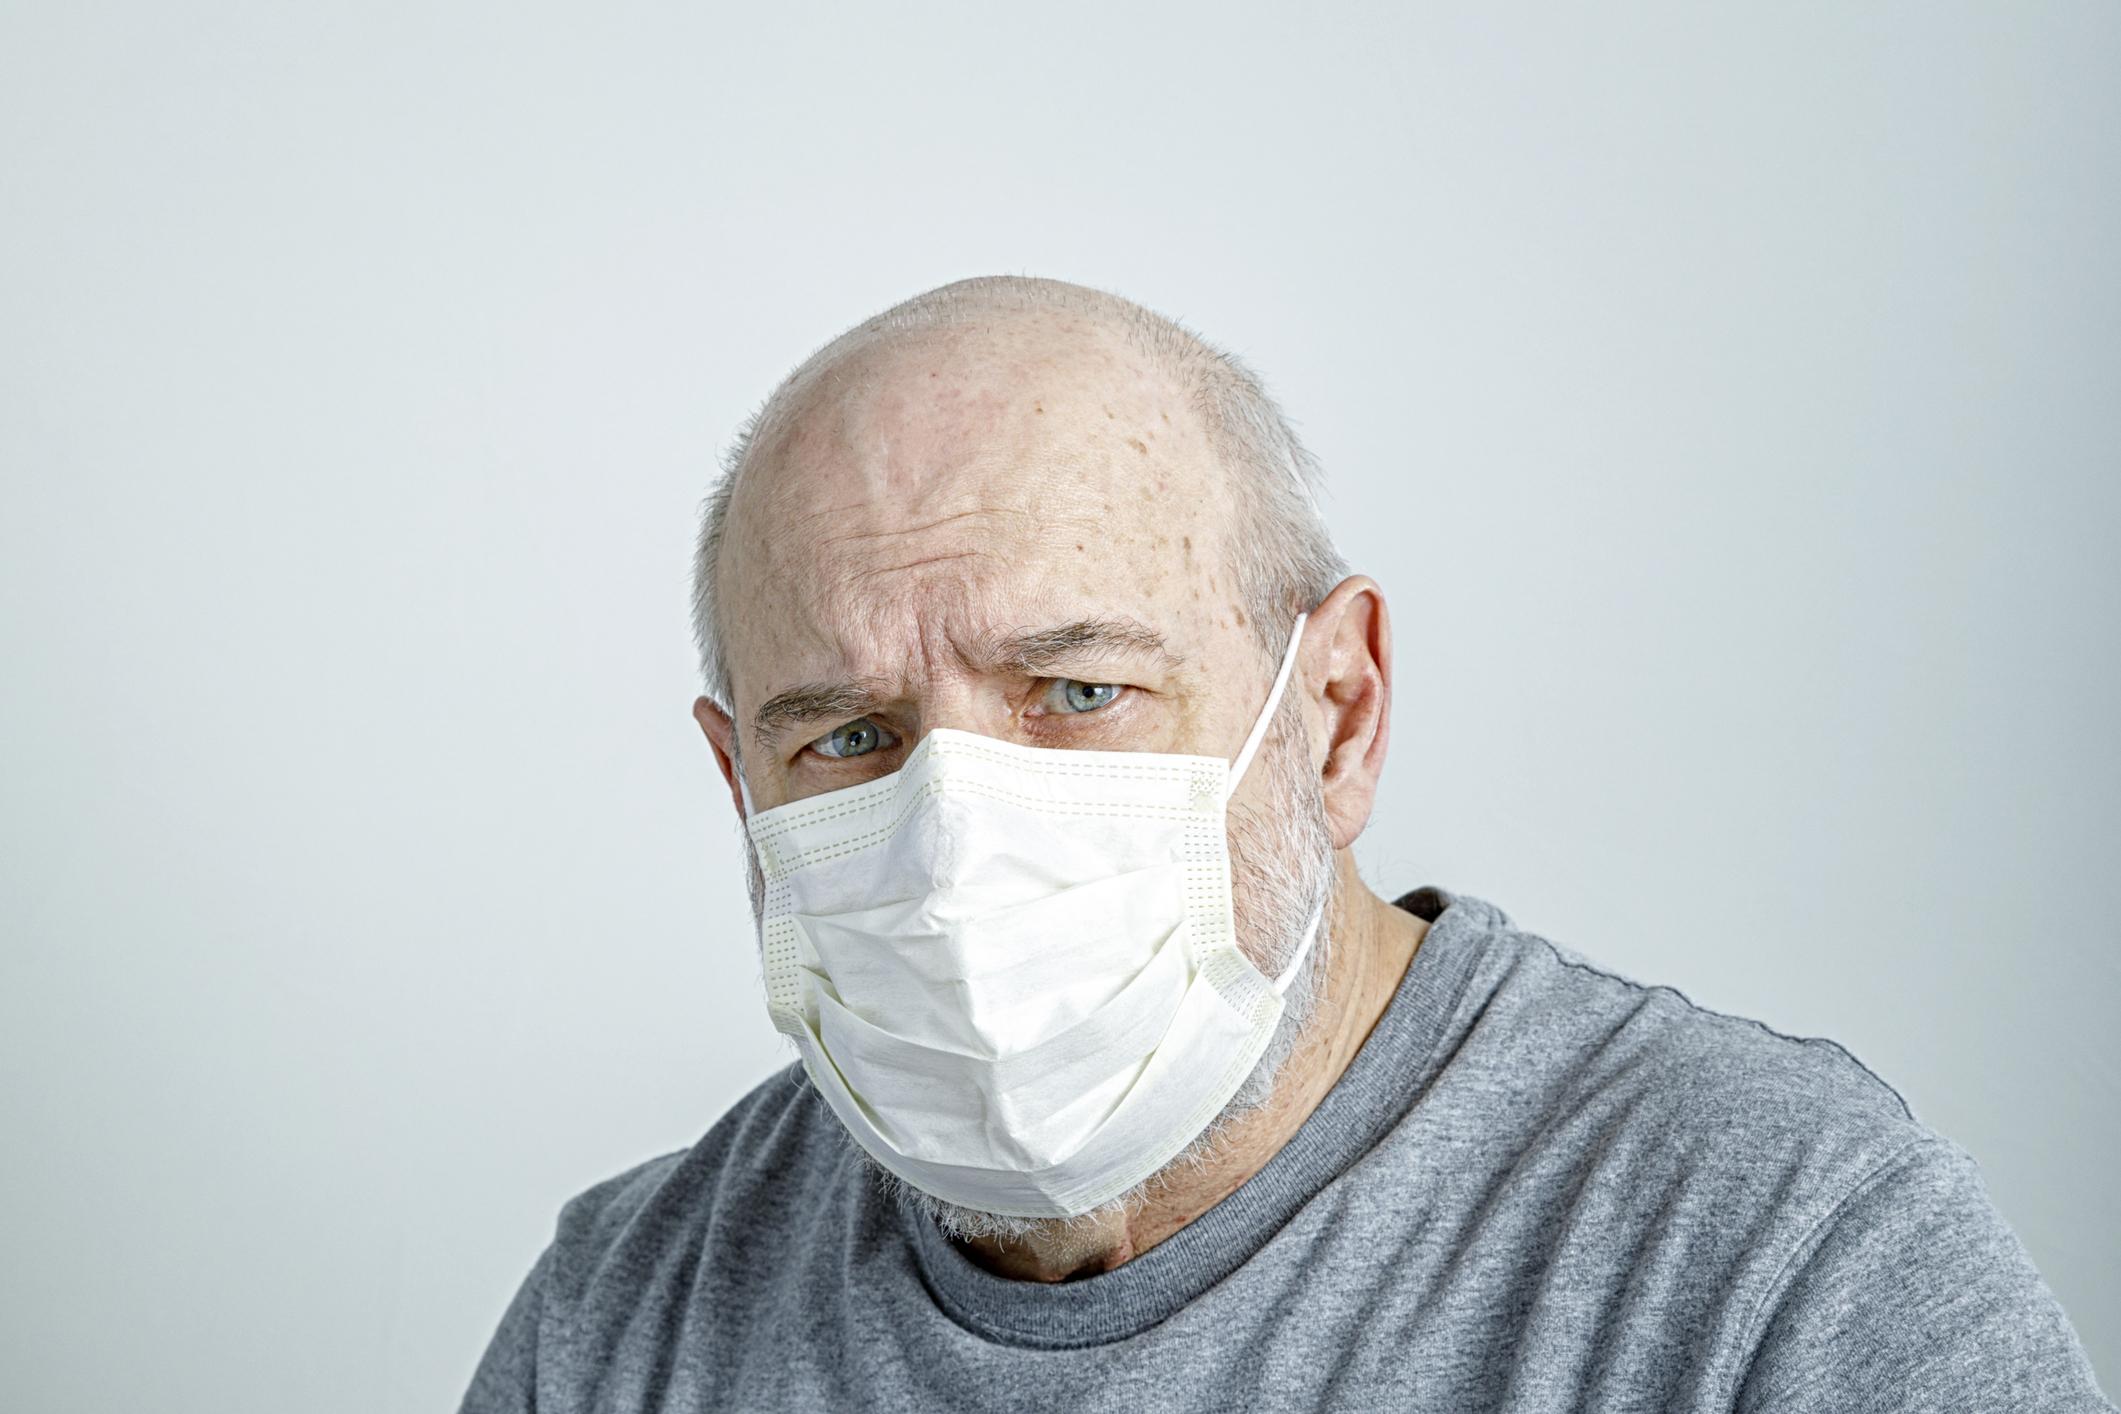 elderly man, face mask